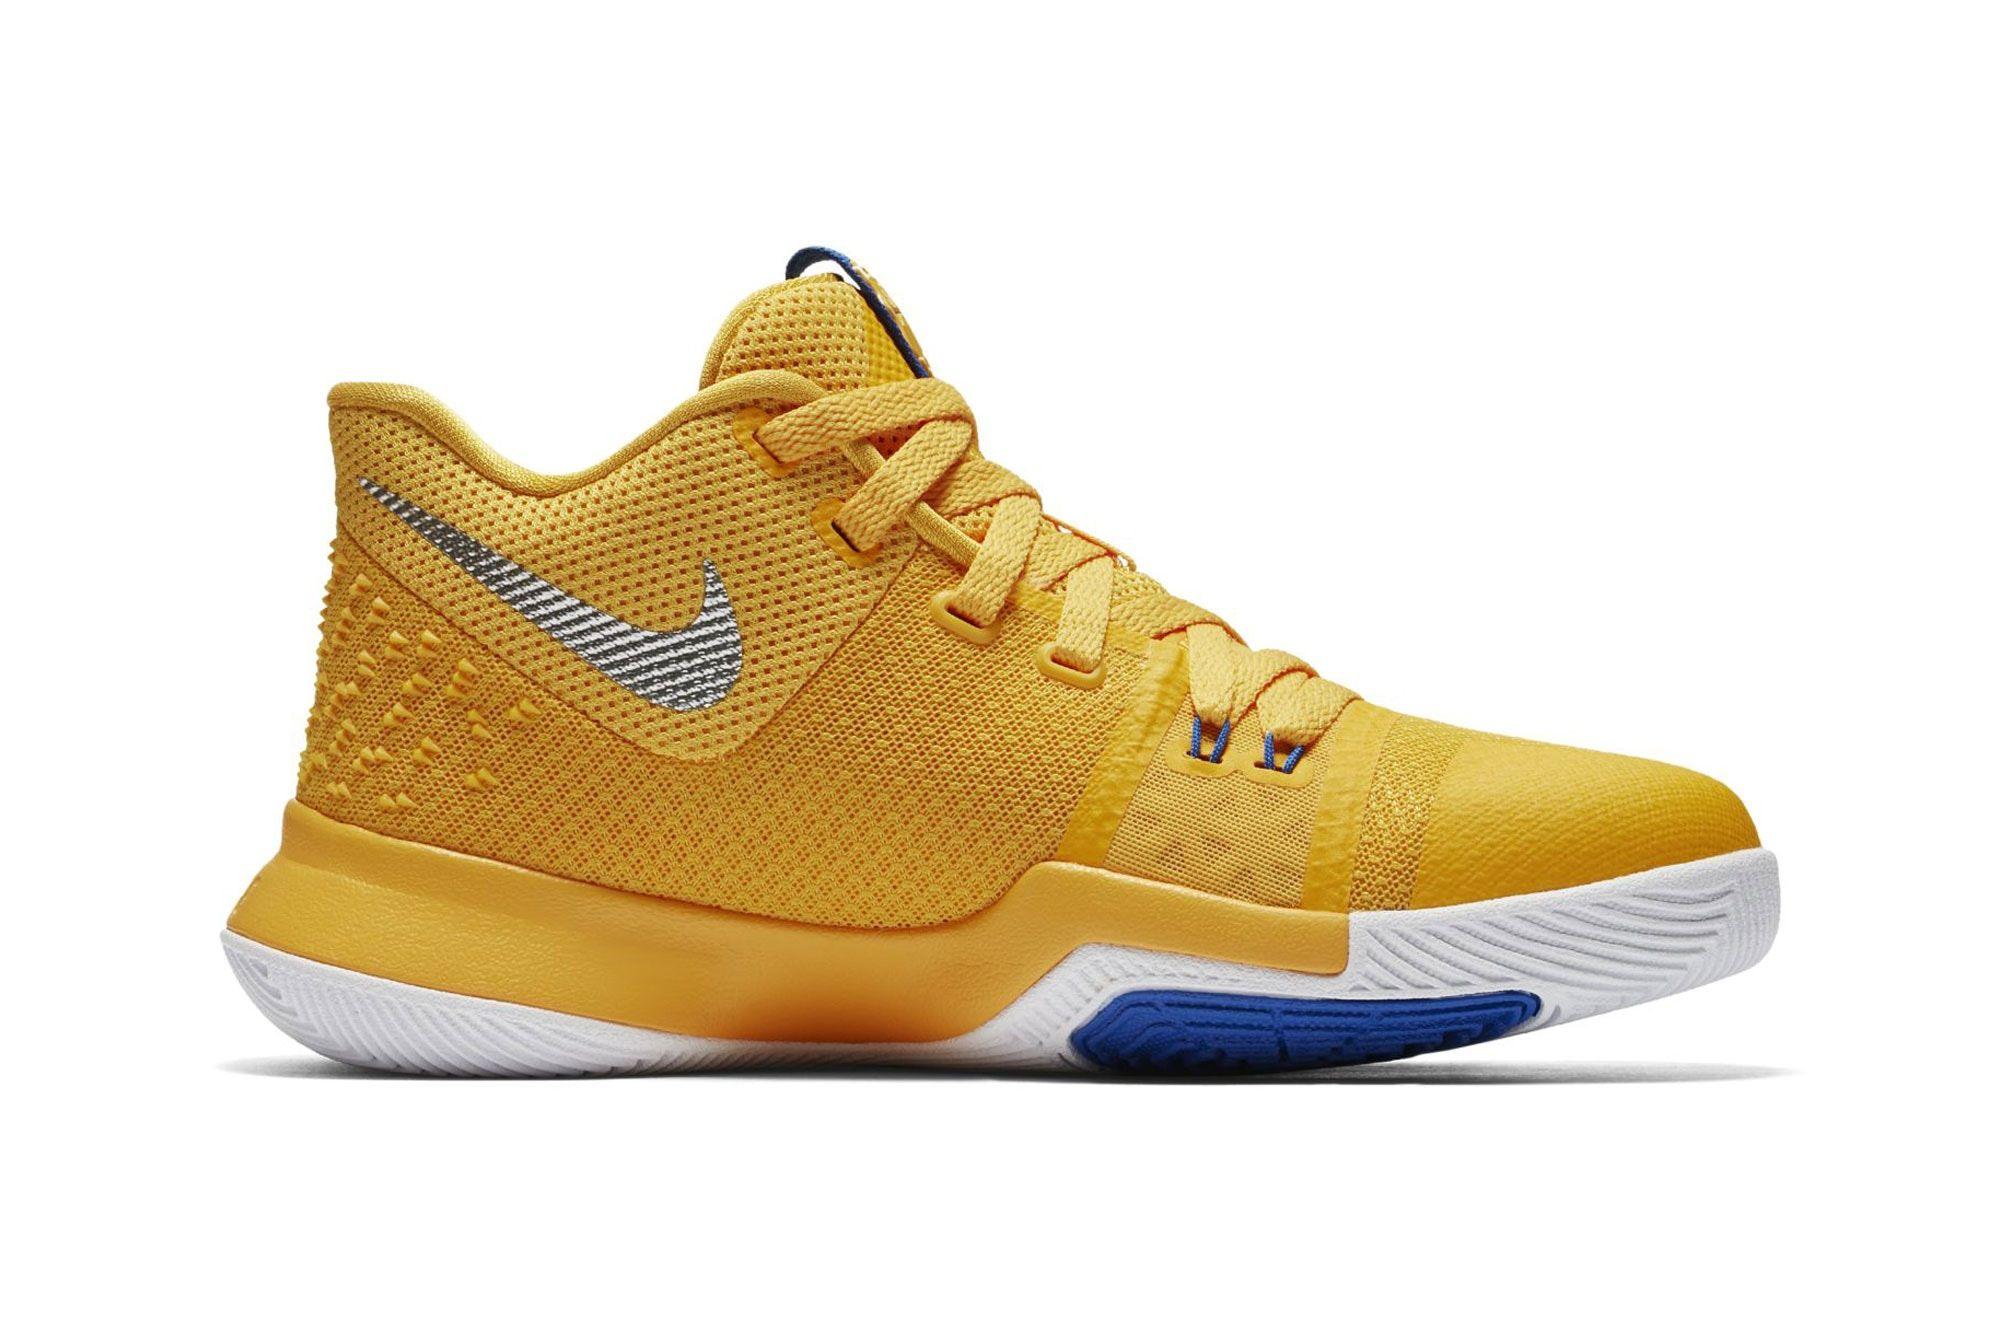 watch 19197 8609f Nike Basketball Kyrie Irving 3 Macaroni Cheese Mac Cleveland ...